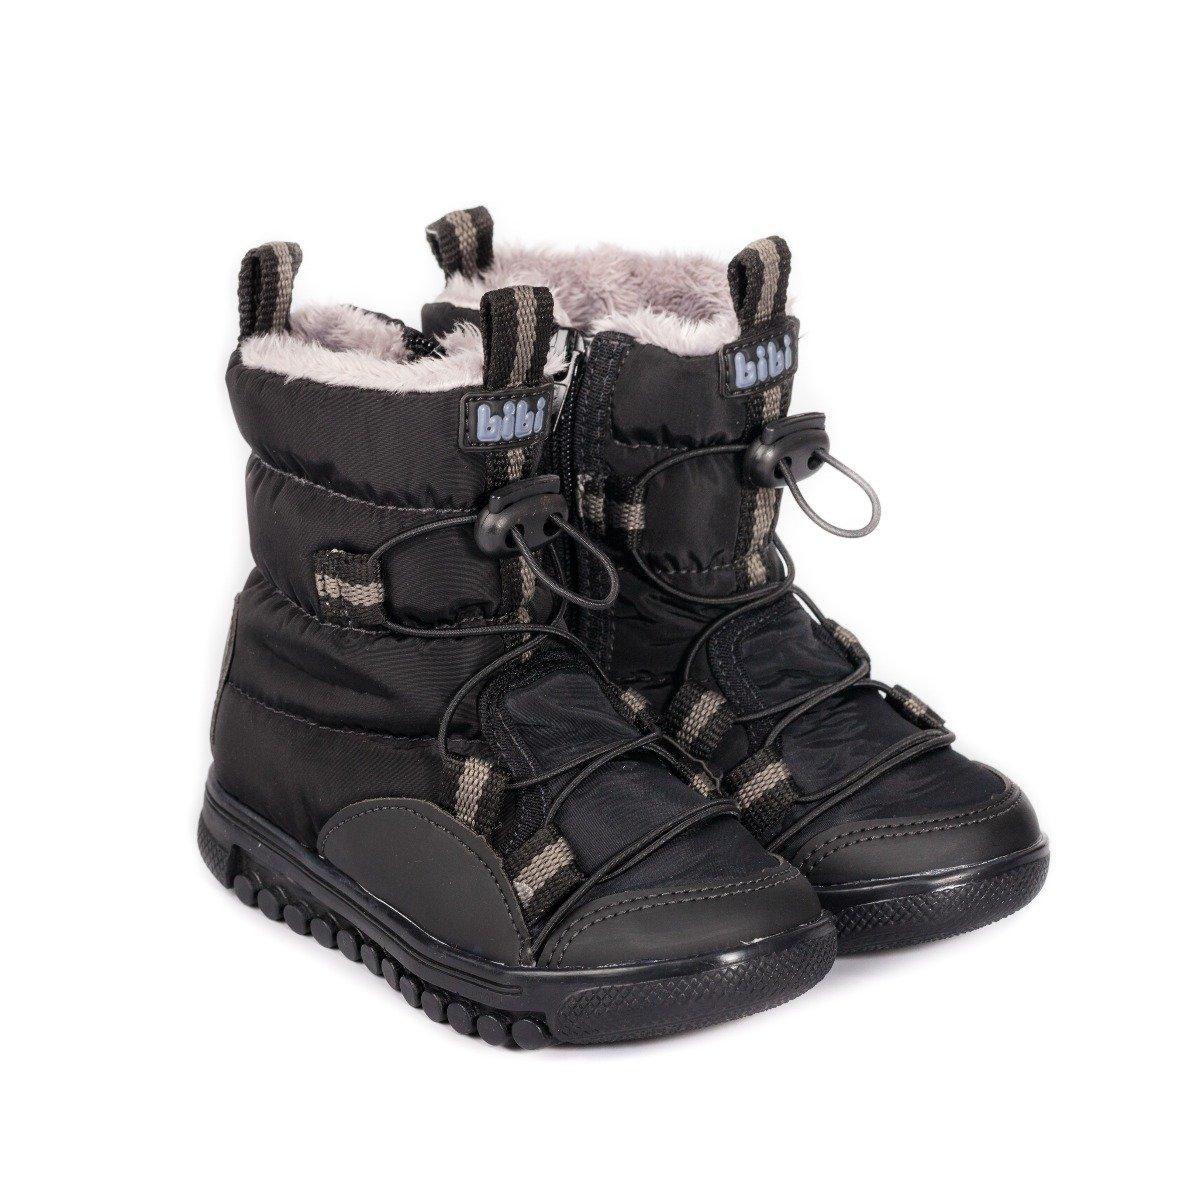 Cizme unisex cu blanita Bibi Shoes Roller New